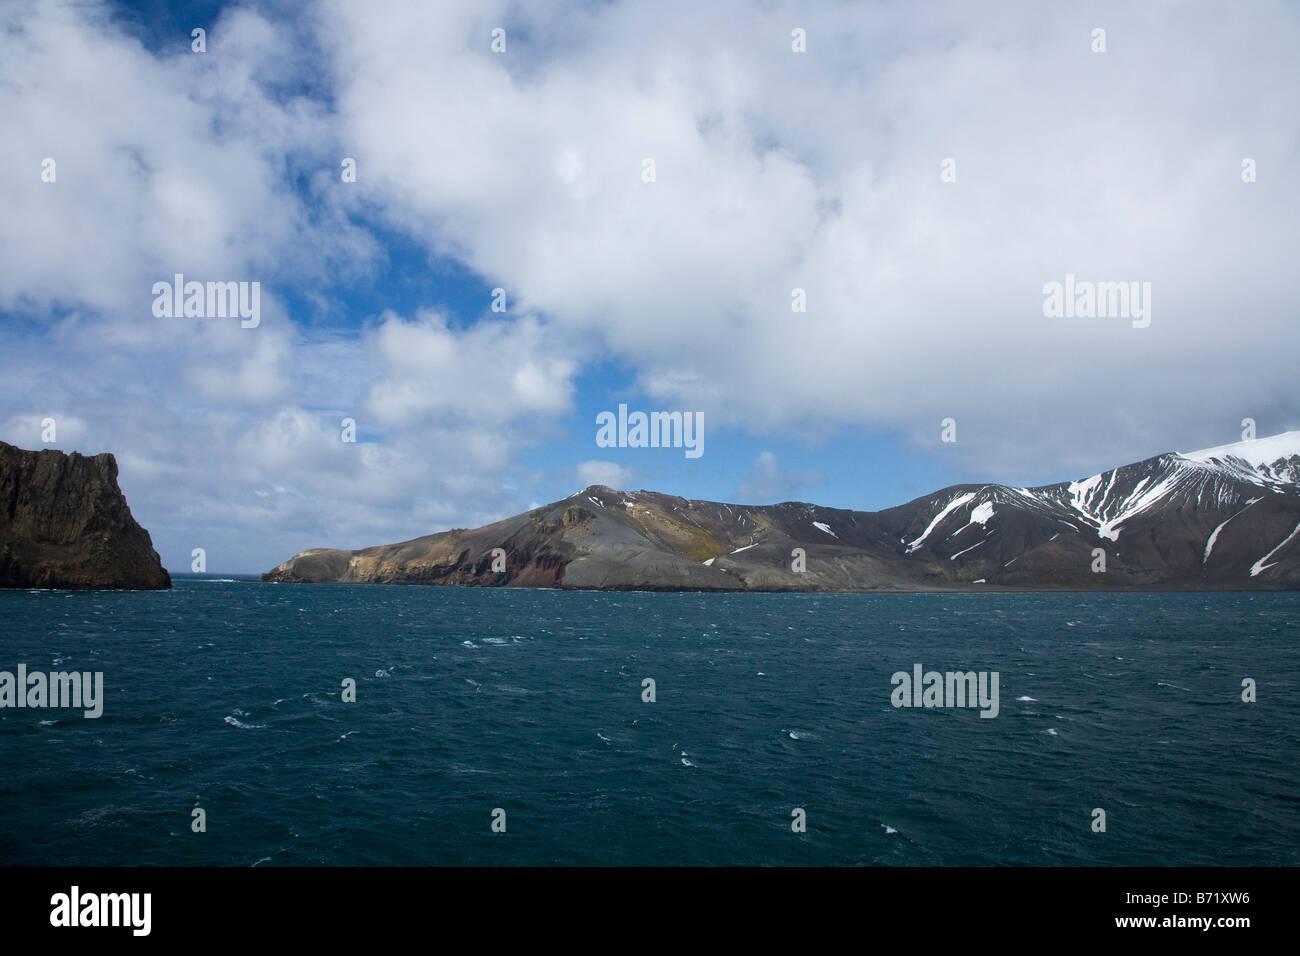 Neptune's Bellows entrance to the flooded caldera of Deception Island South Shetland Islands Antarctica - Stock Image